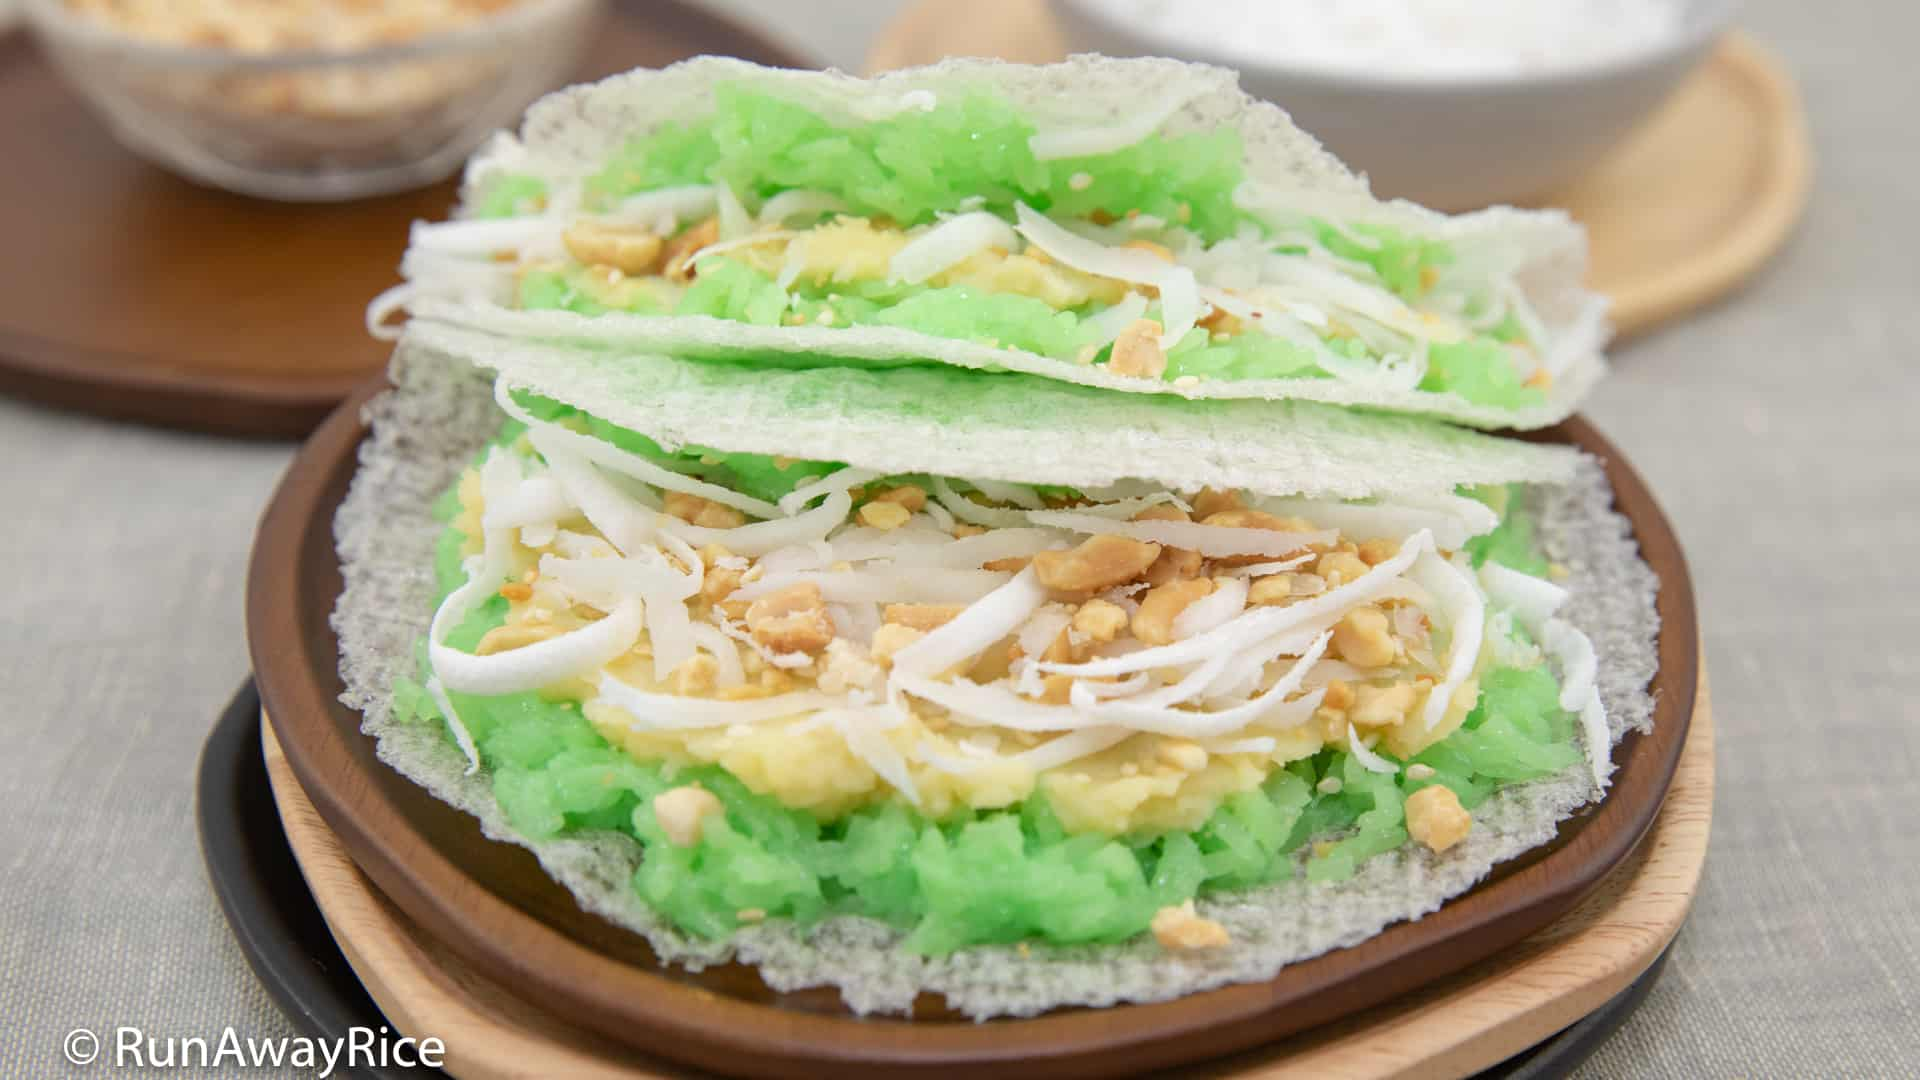 Pandan Sticky Rice with Tapioca Paper (Xoi Boc Banh Trang) - Breakfast or Snack Food!   recipe from runawayrice.com